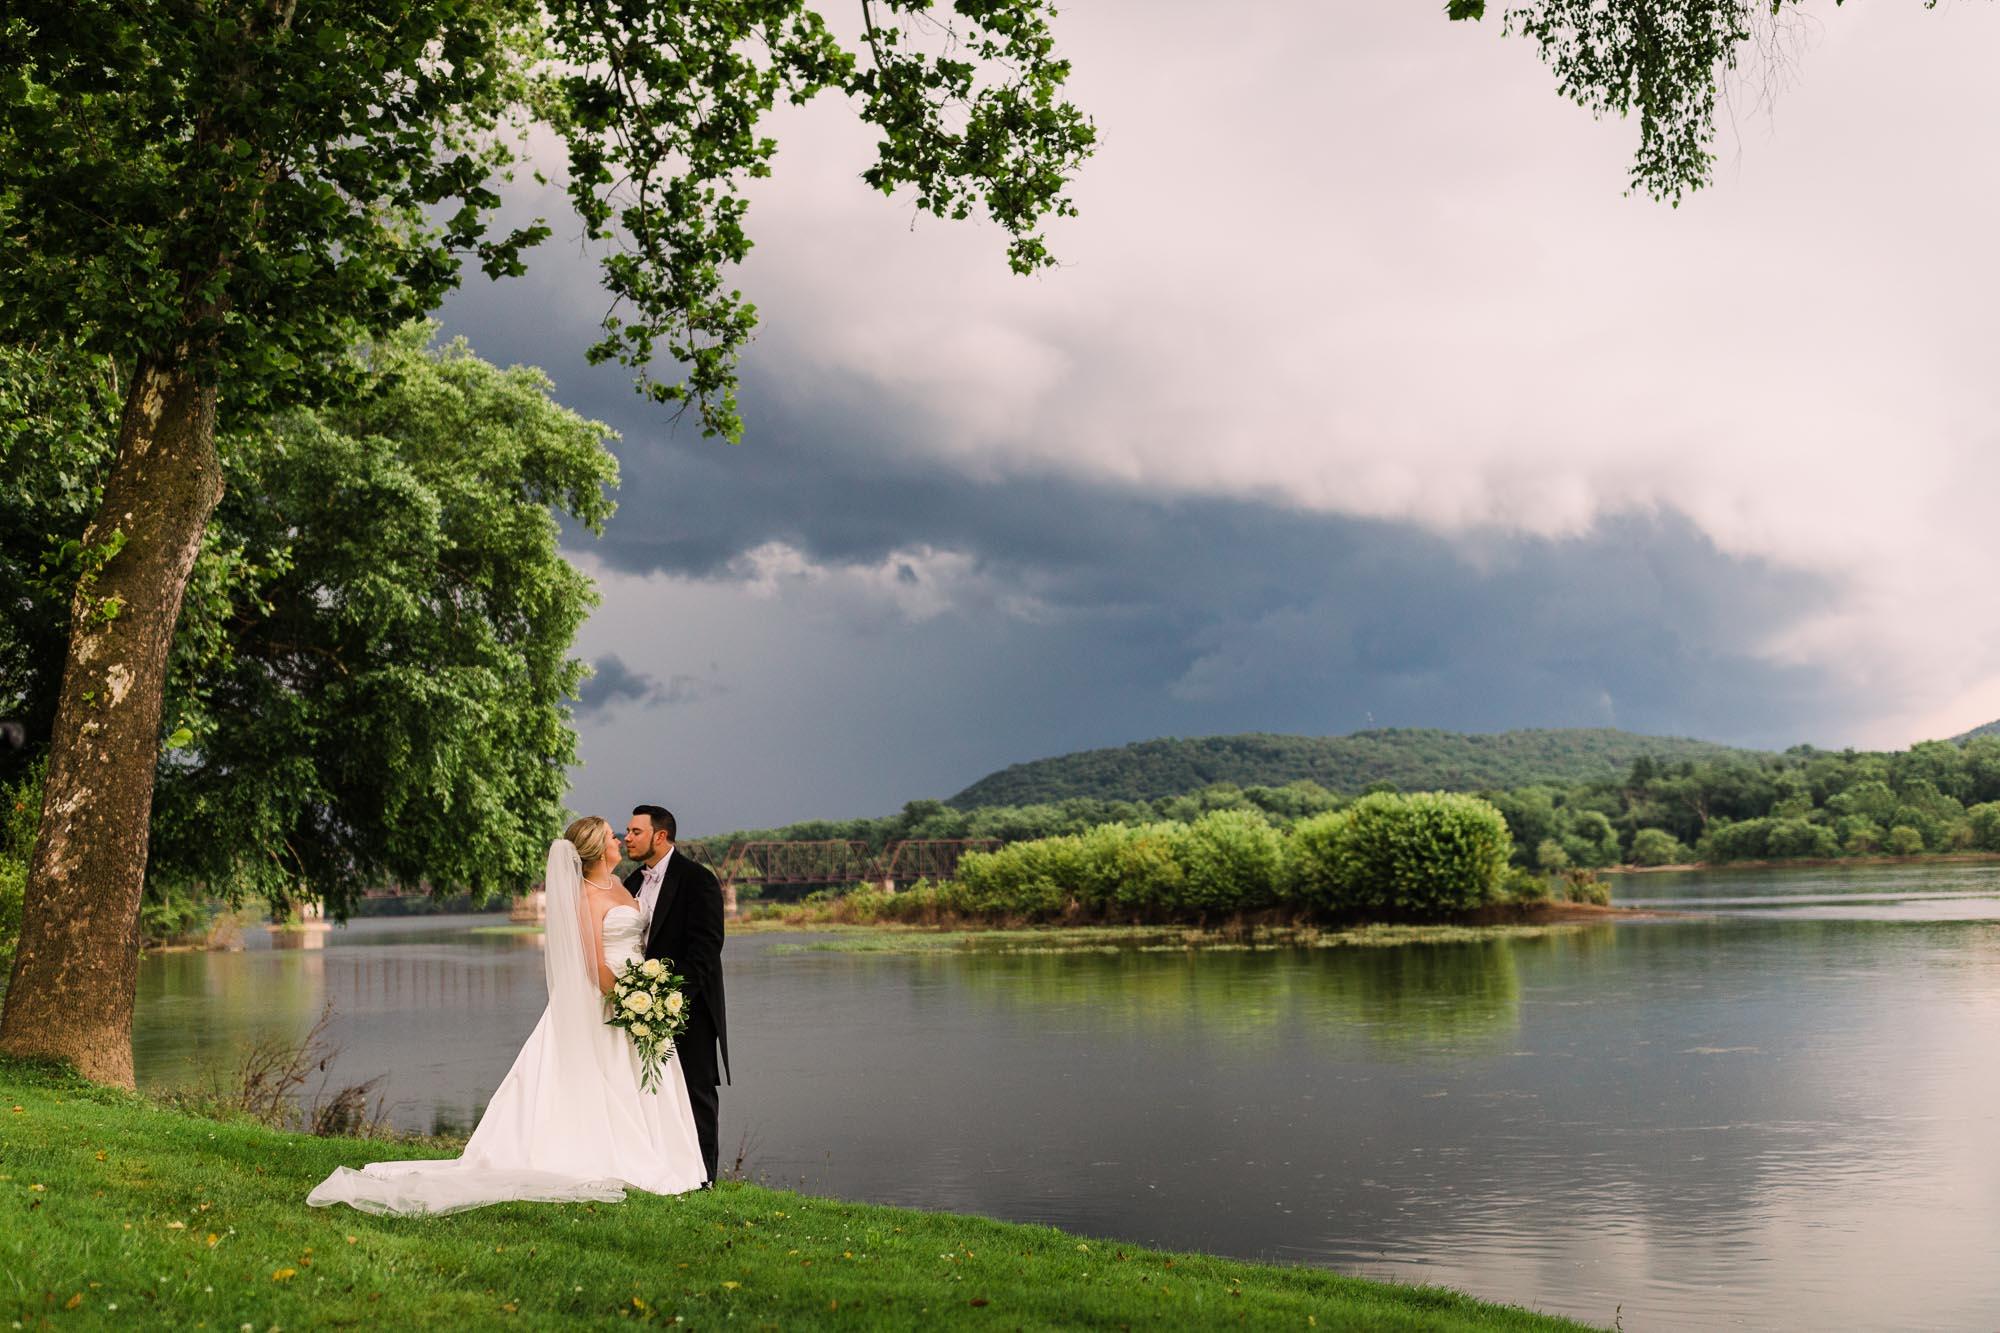 isle-of-que-wedding-6980.jpg